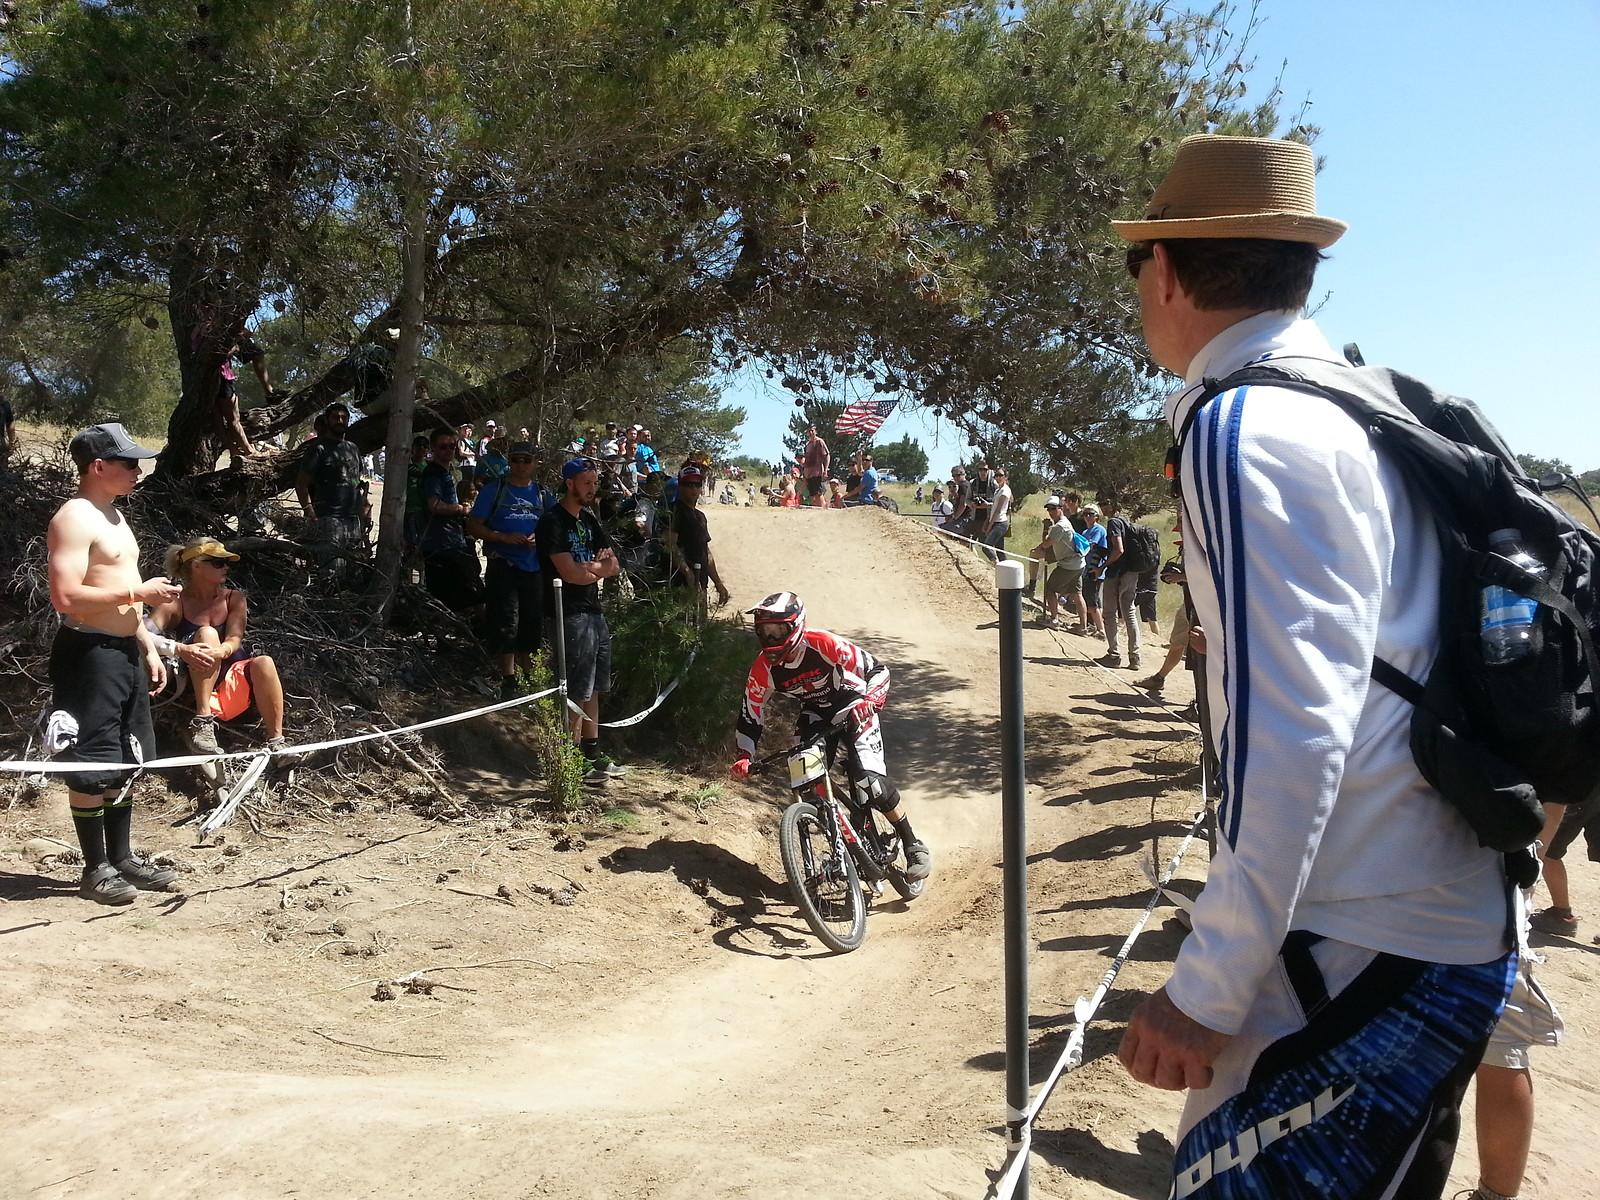 Neko 1 - djames - Mountain Biking Pictures - Vital MTB